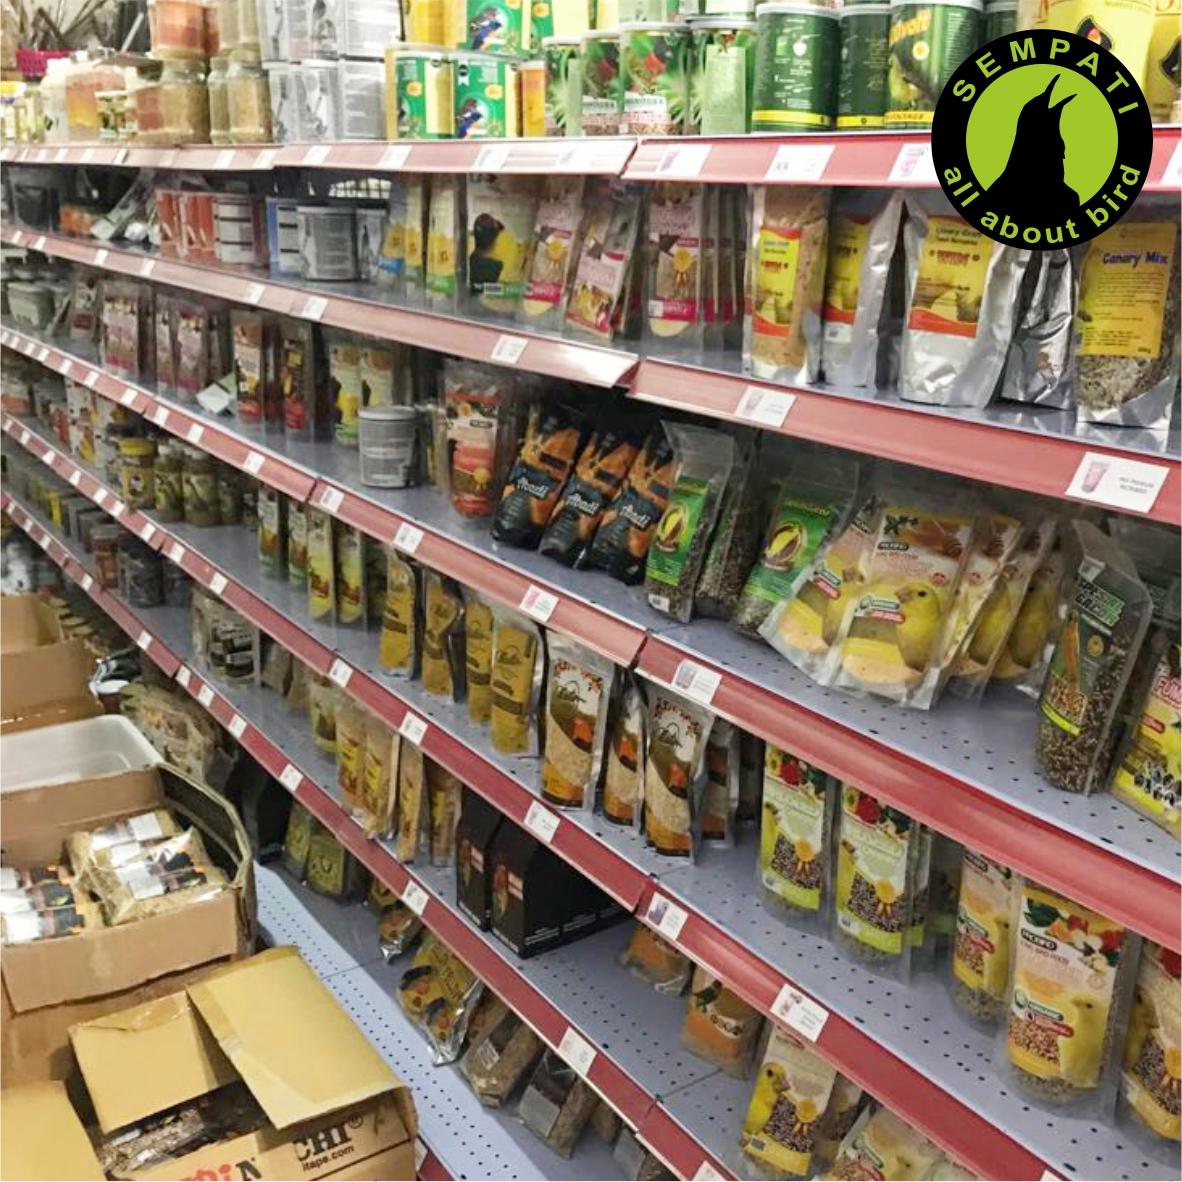 Super Power Insect Bird Food Pakan Voer Harian Lomba Untuk Burung Murai Kacer Anis Cucak Jalak Poksay Wambi Ciblek Dll Sempati Bird Shop